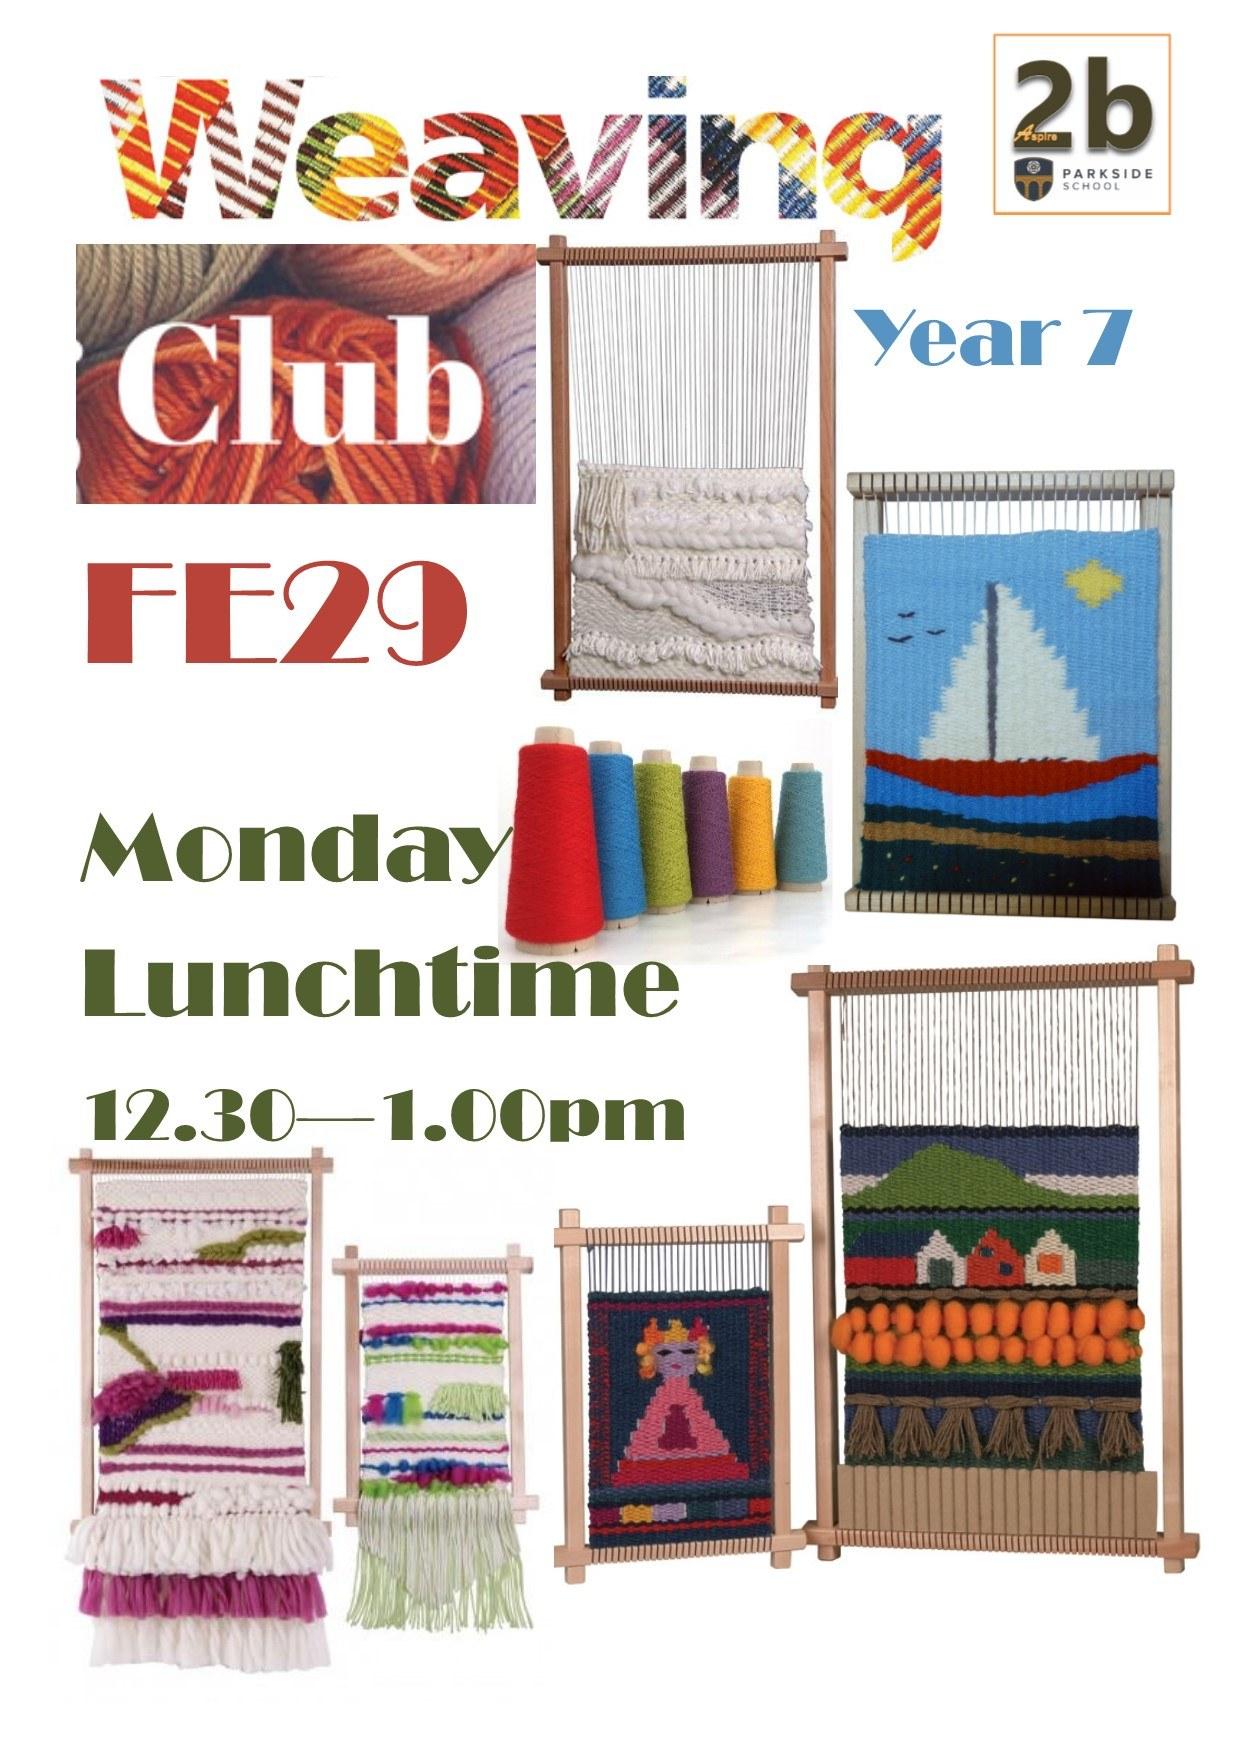 weaving-club-poster.jpg#asset:4030